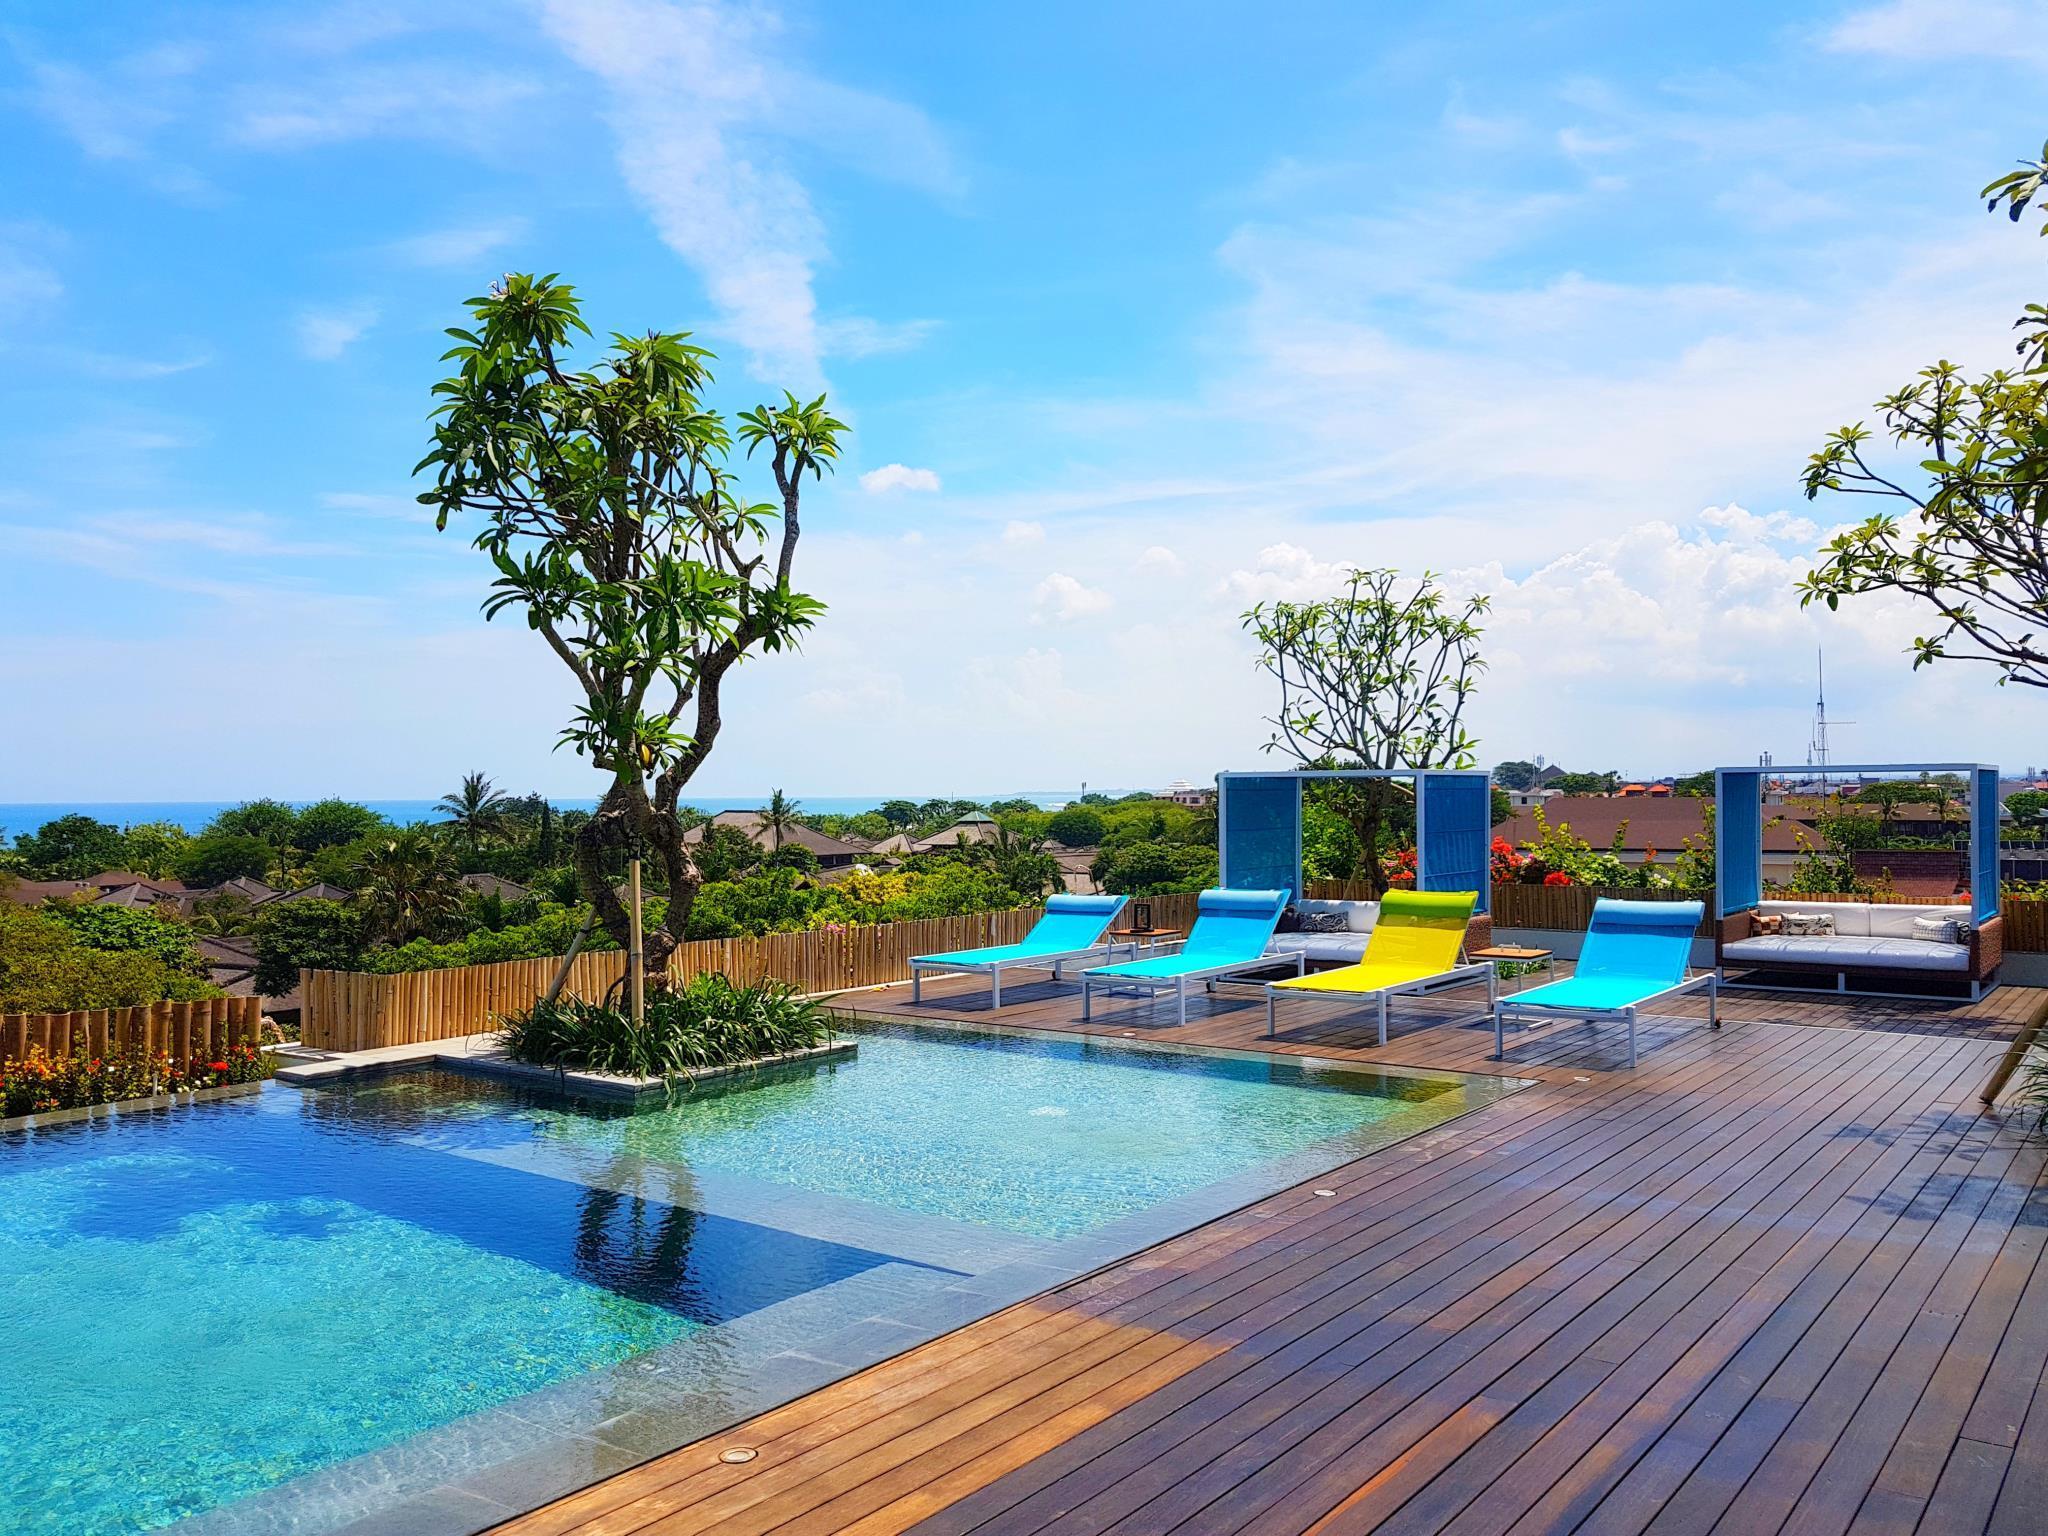 Best Price on Rama Residence Padma in Bali Reviews